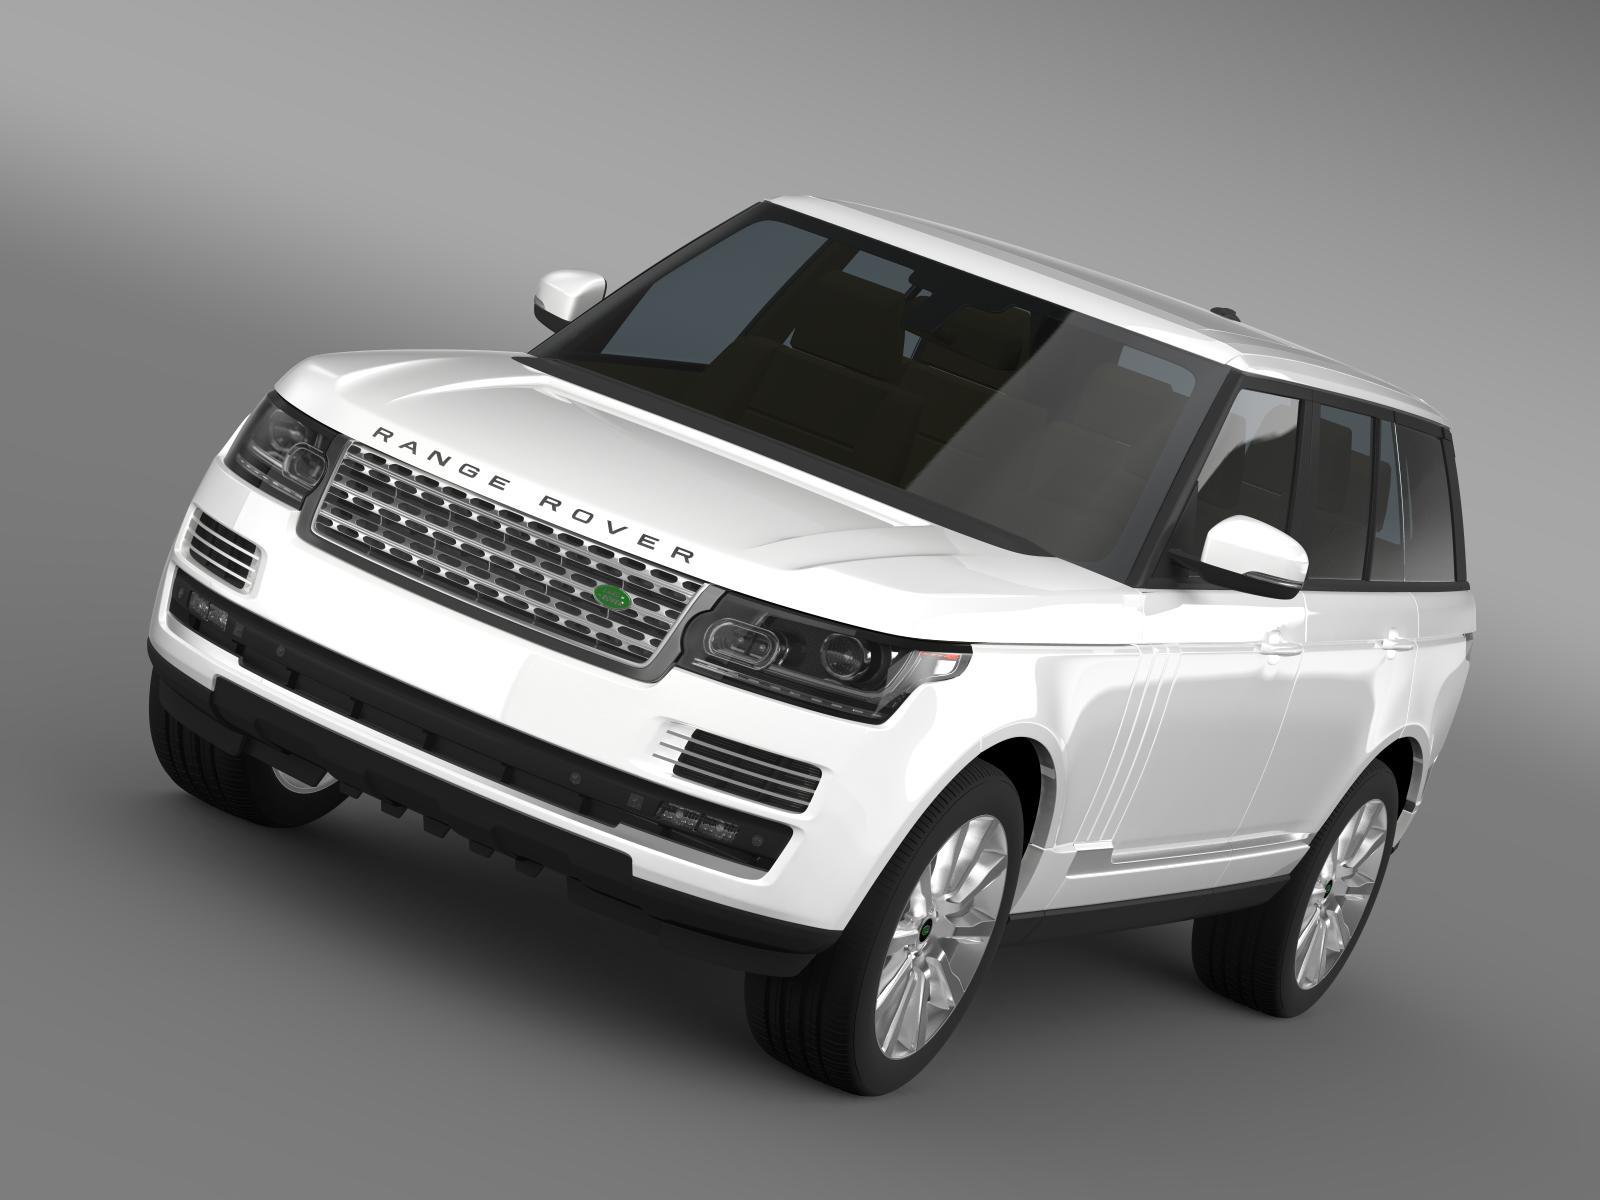 range rover supercharged l405 3d model 3ds max fbx c4d lwo ma mb hrc xsi obj 162191